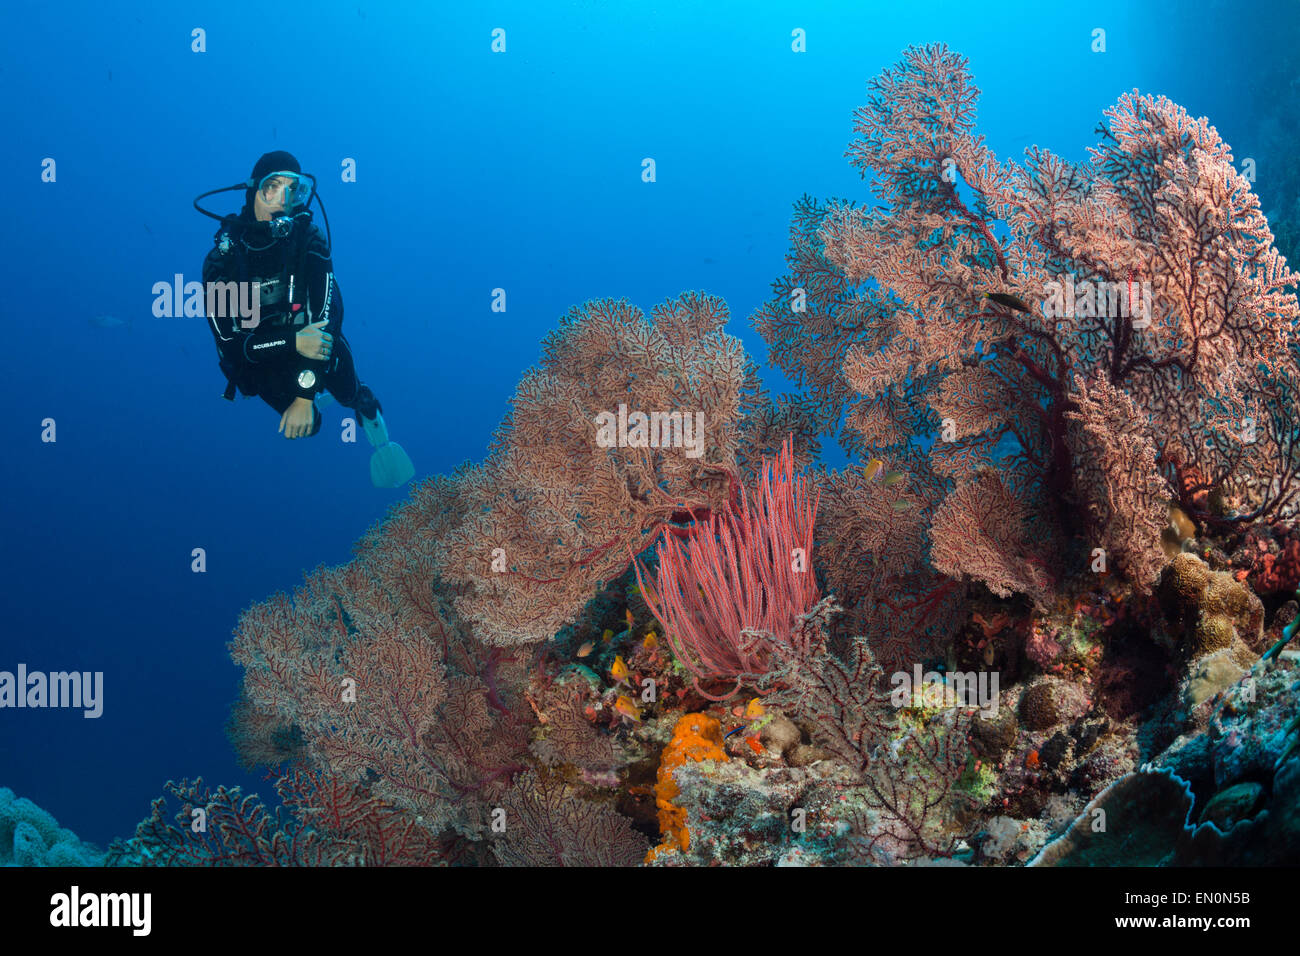 Scuba Diver over Coral Reef, Osprey Reef, Coral Sea, Australia - Stock Image